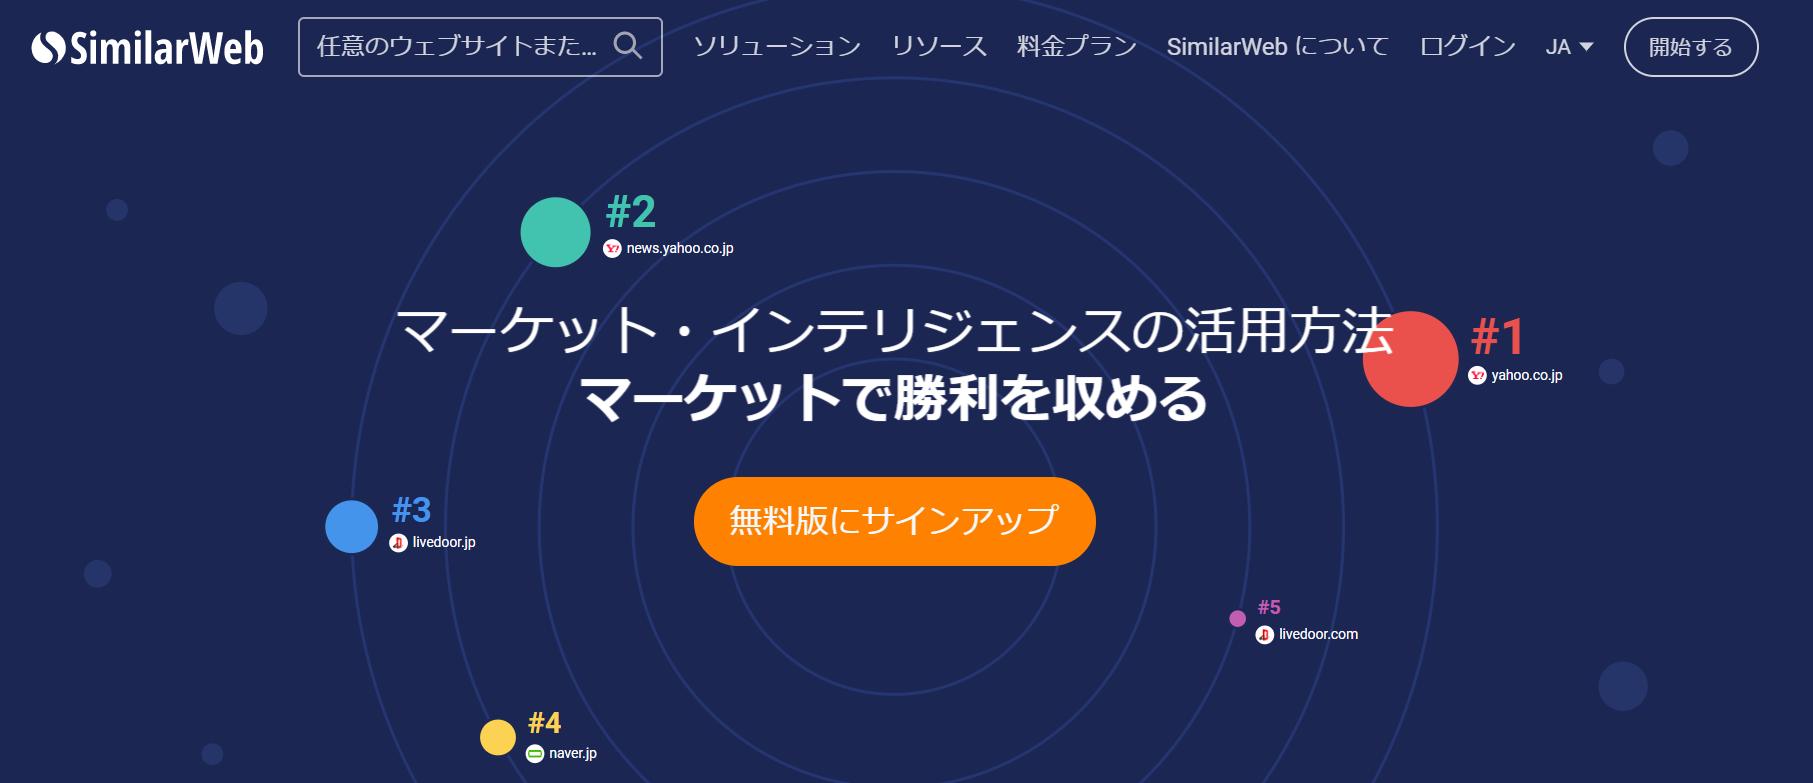 Similarweb(シミラーウェブ)の使い方